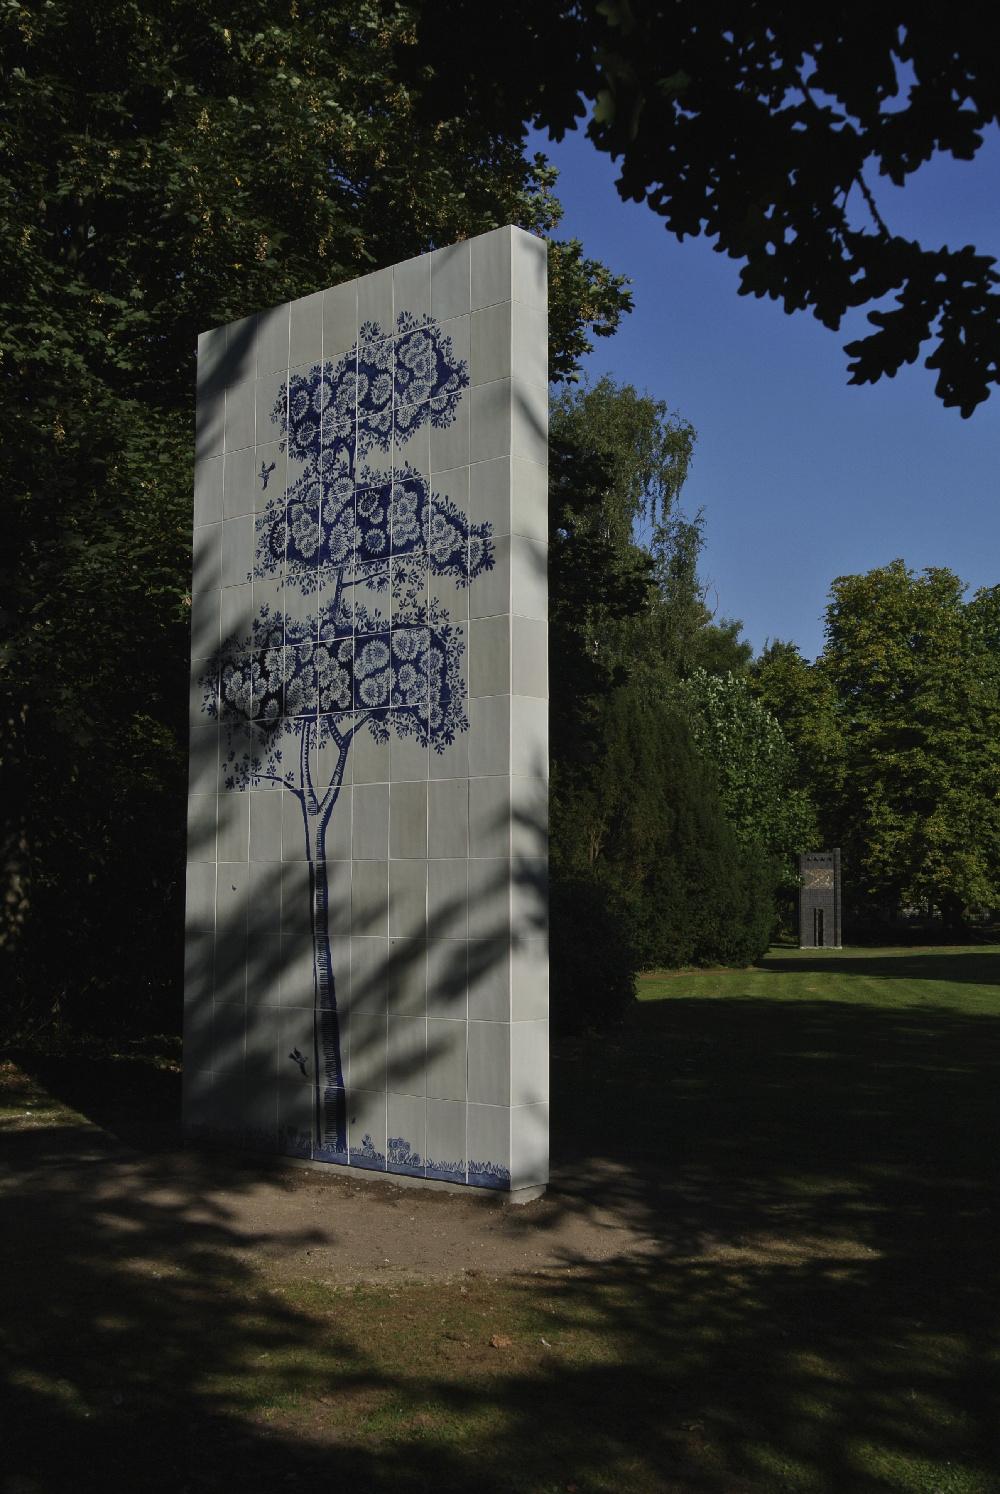 The Guldagergård Tree (after Spode) 4